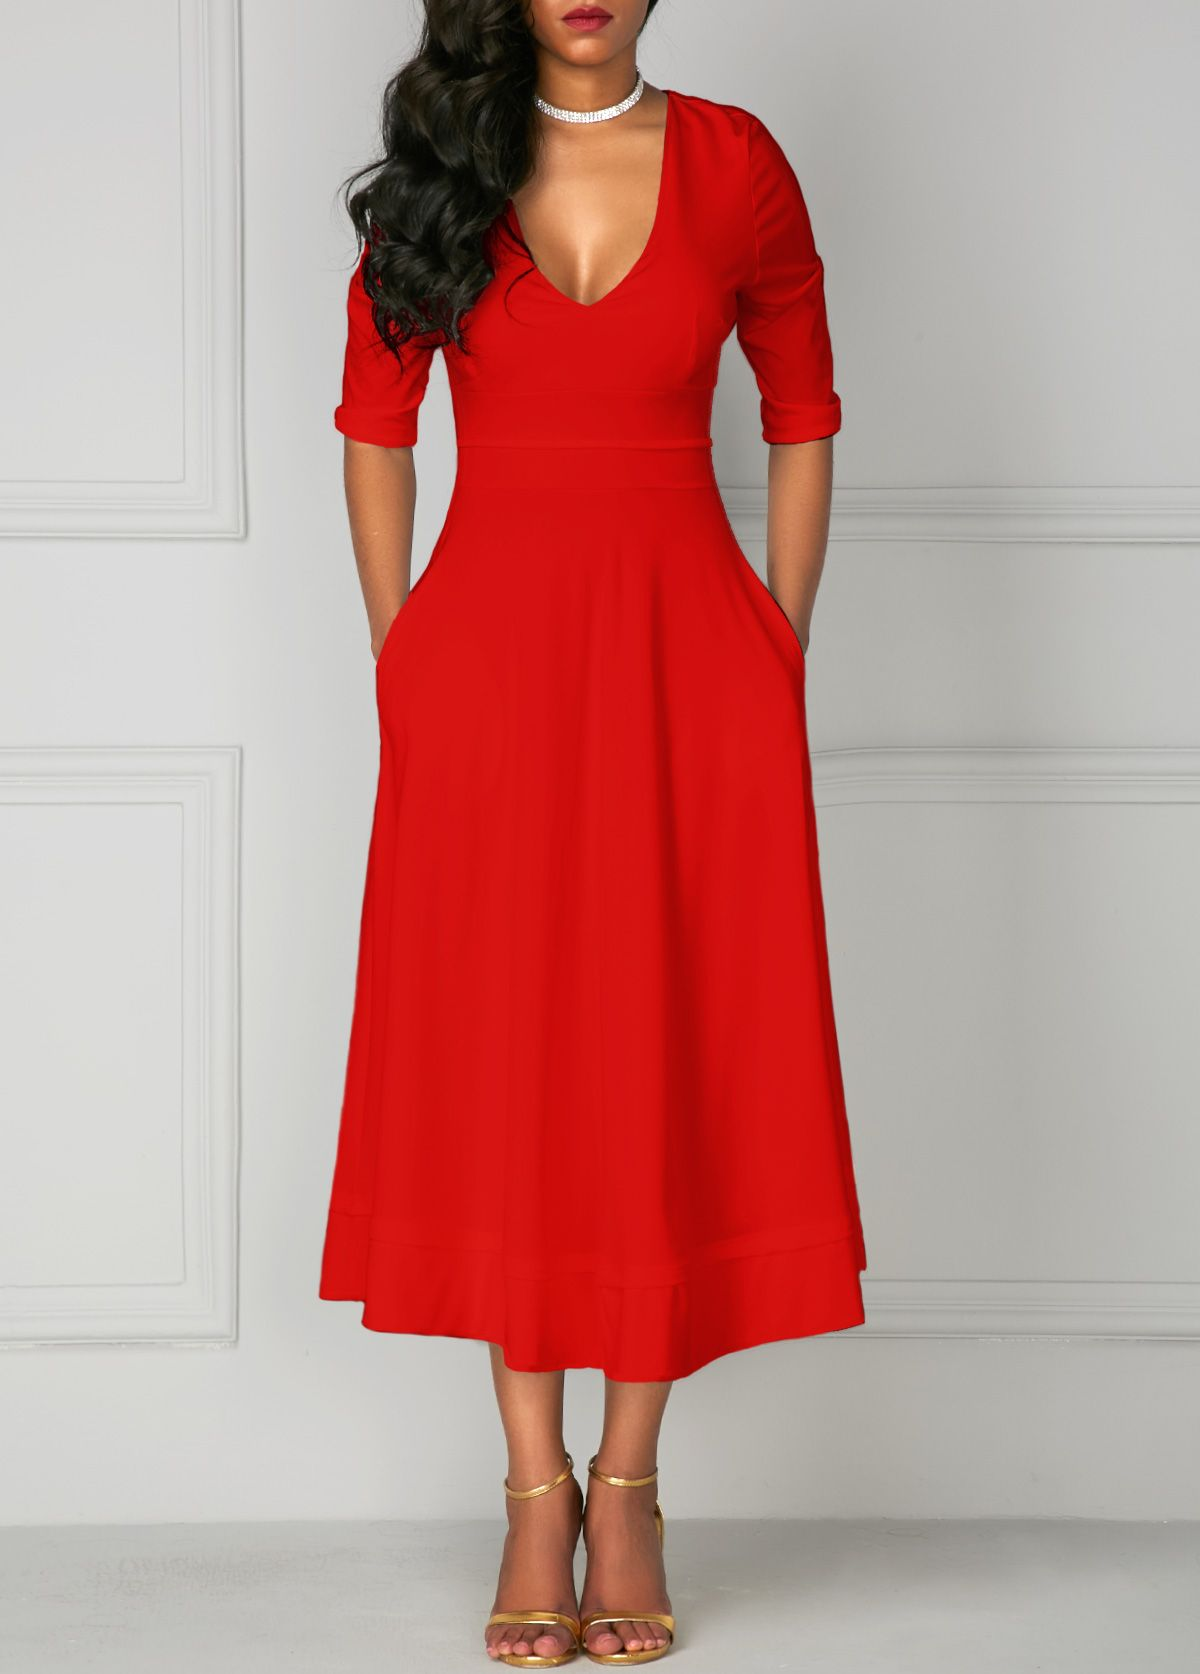 Red V Neck High Waist Half Sleeve Dress